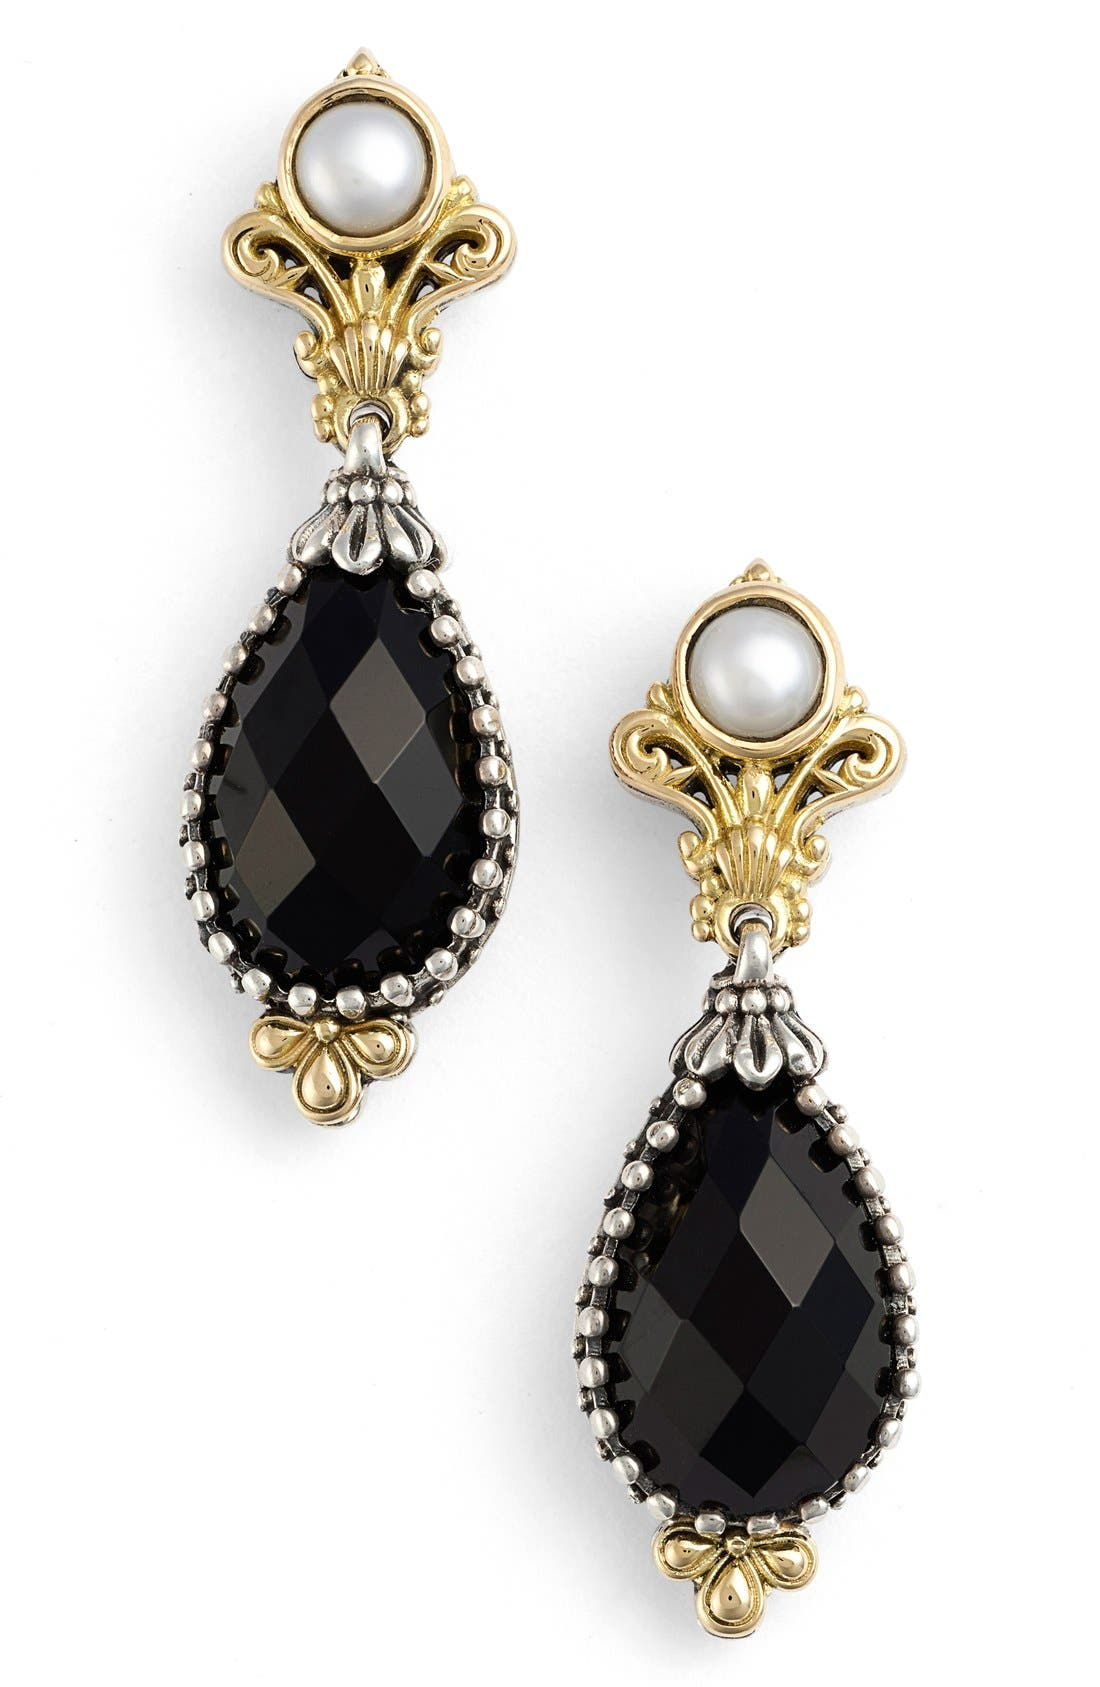 'Nykta' Pearl & Black Onyx Drop Earrings,                         Main,                         color, Silver/ Gold/ Pearl